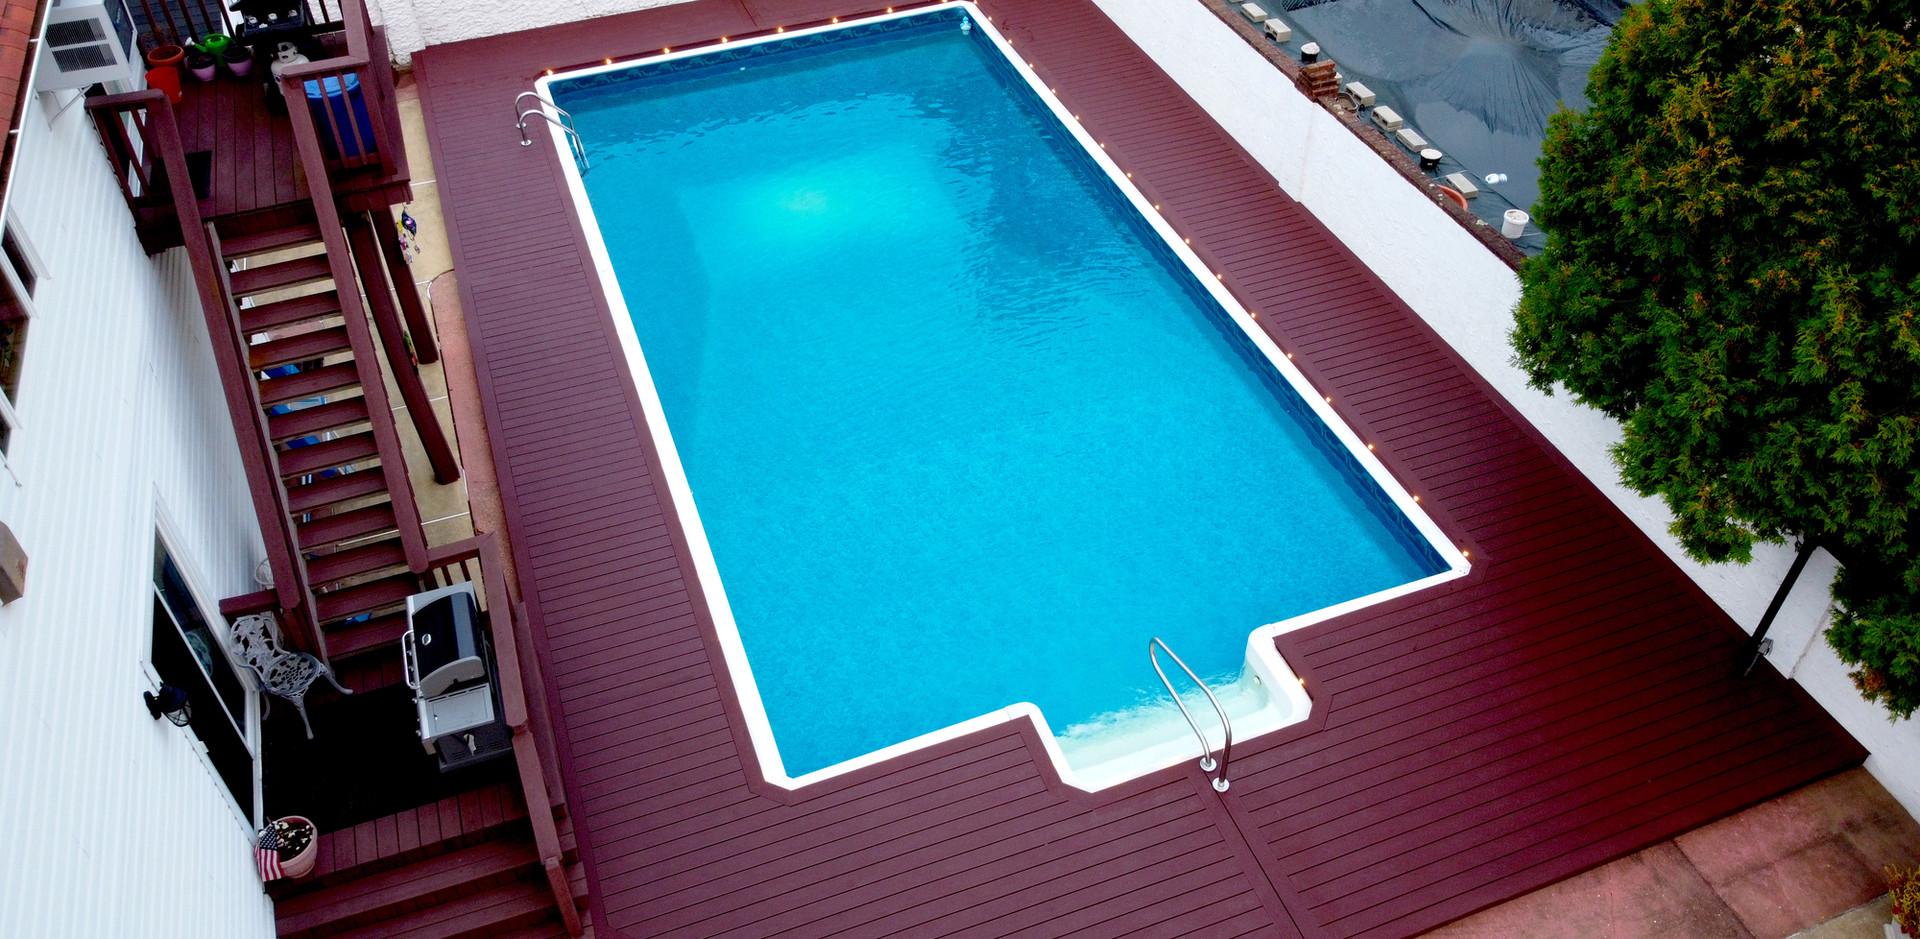 in-ground-pool-deck-side-view.JPG